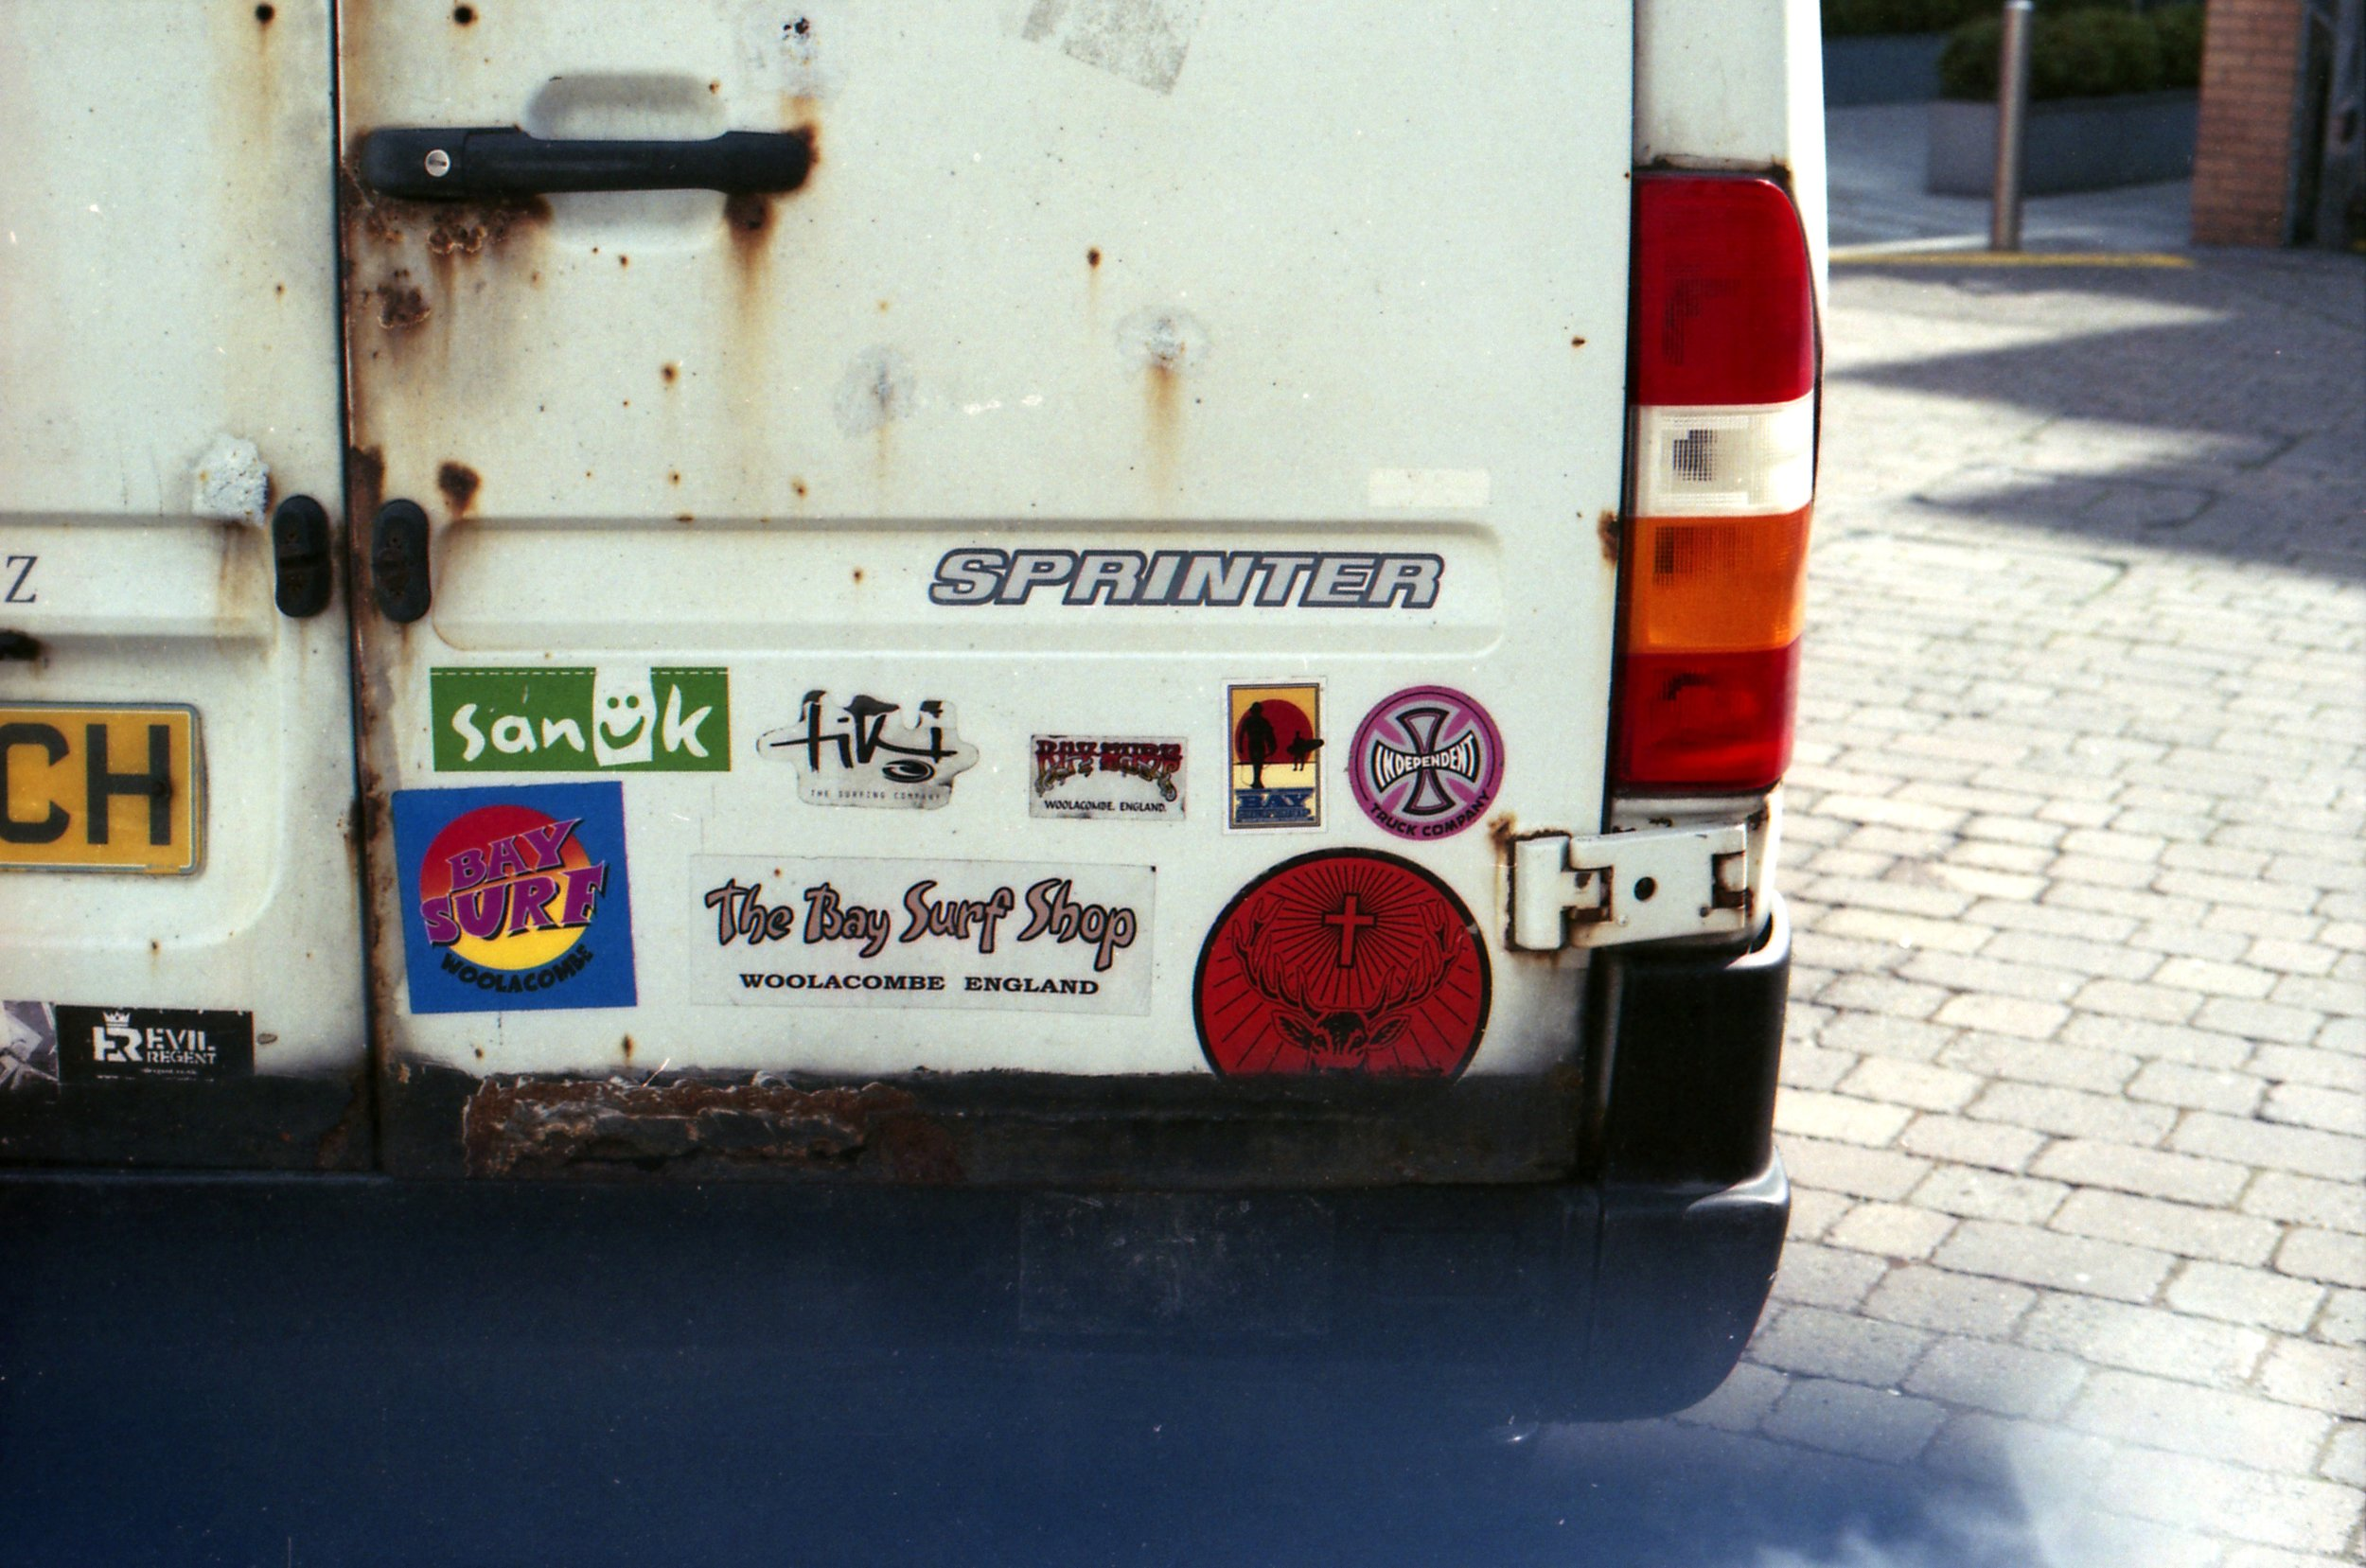 251/366 - These stickers definitely caught my eye.